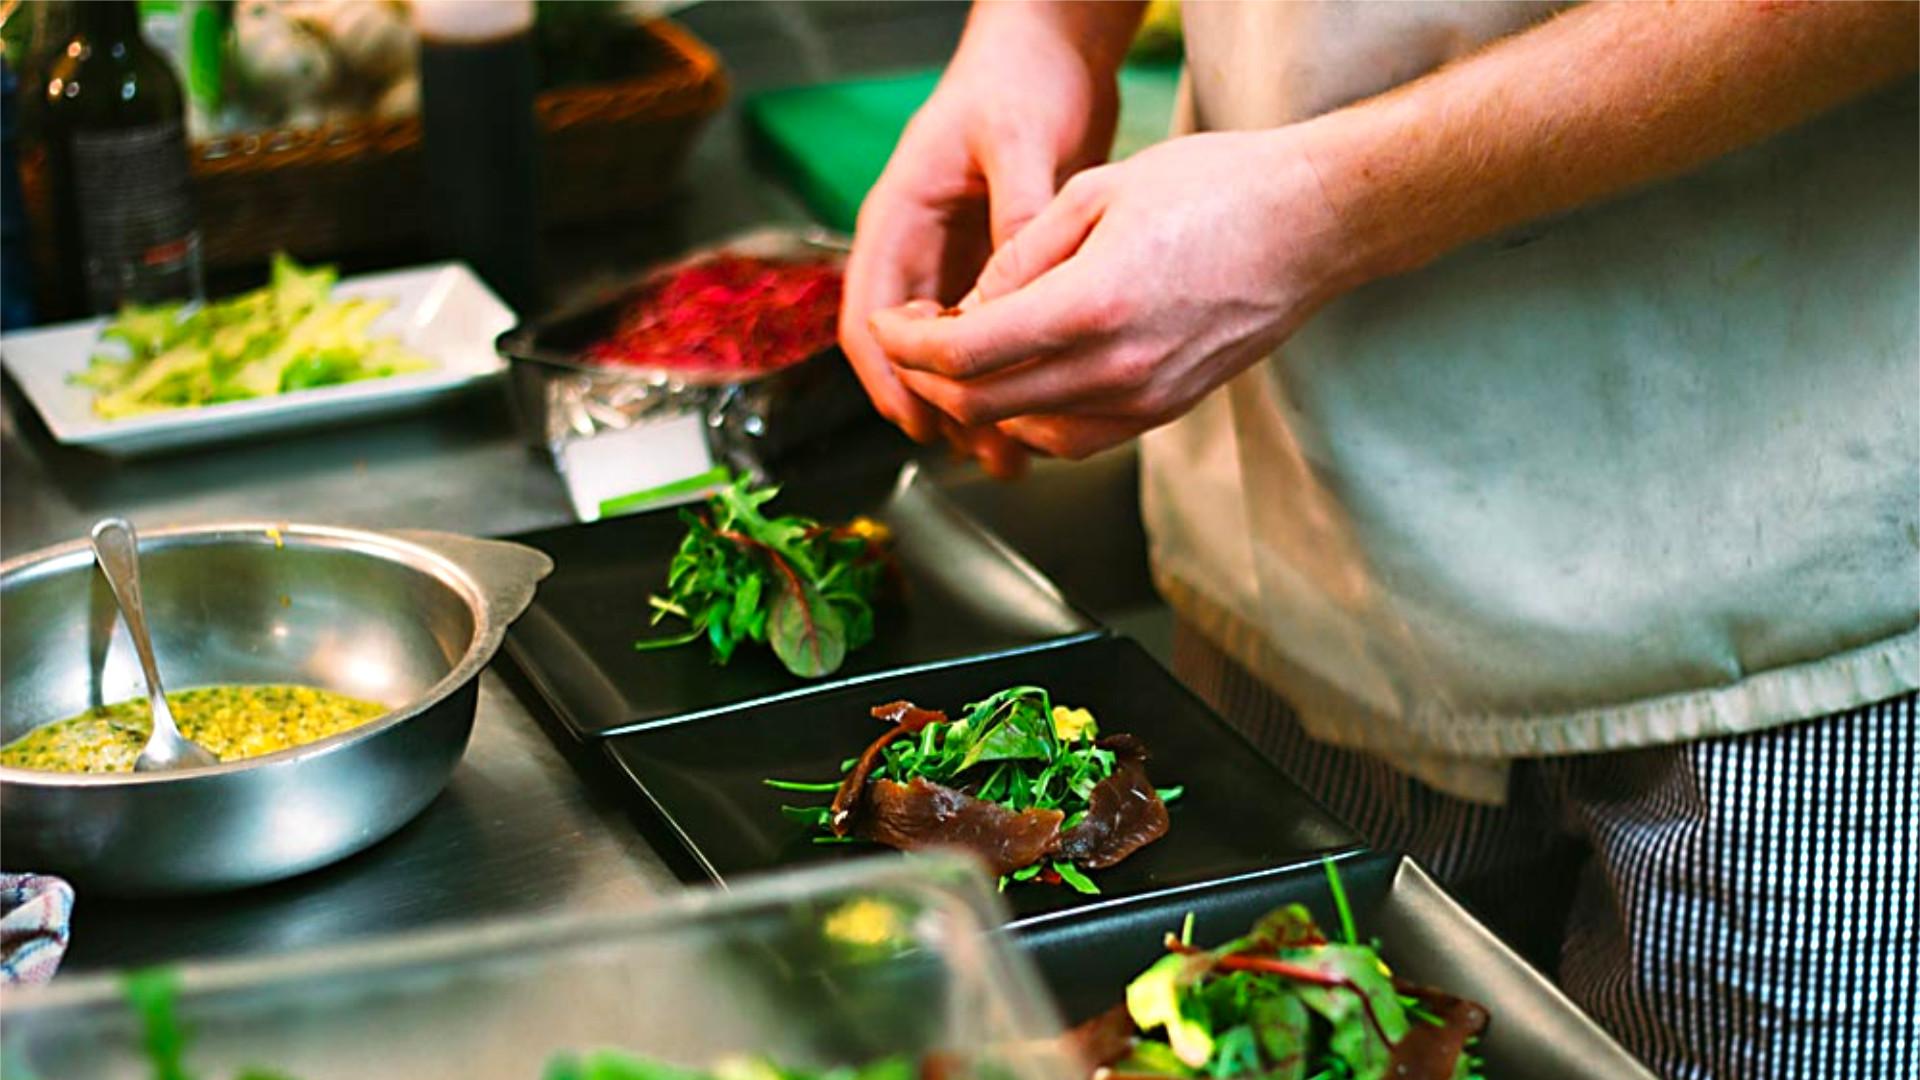 Chef preparing delicious evening meal